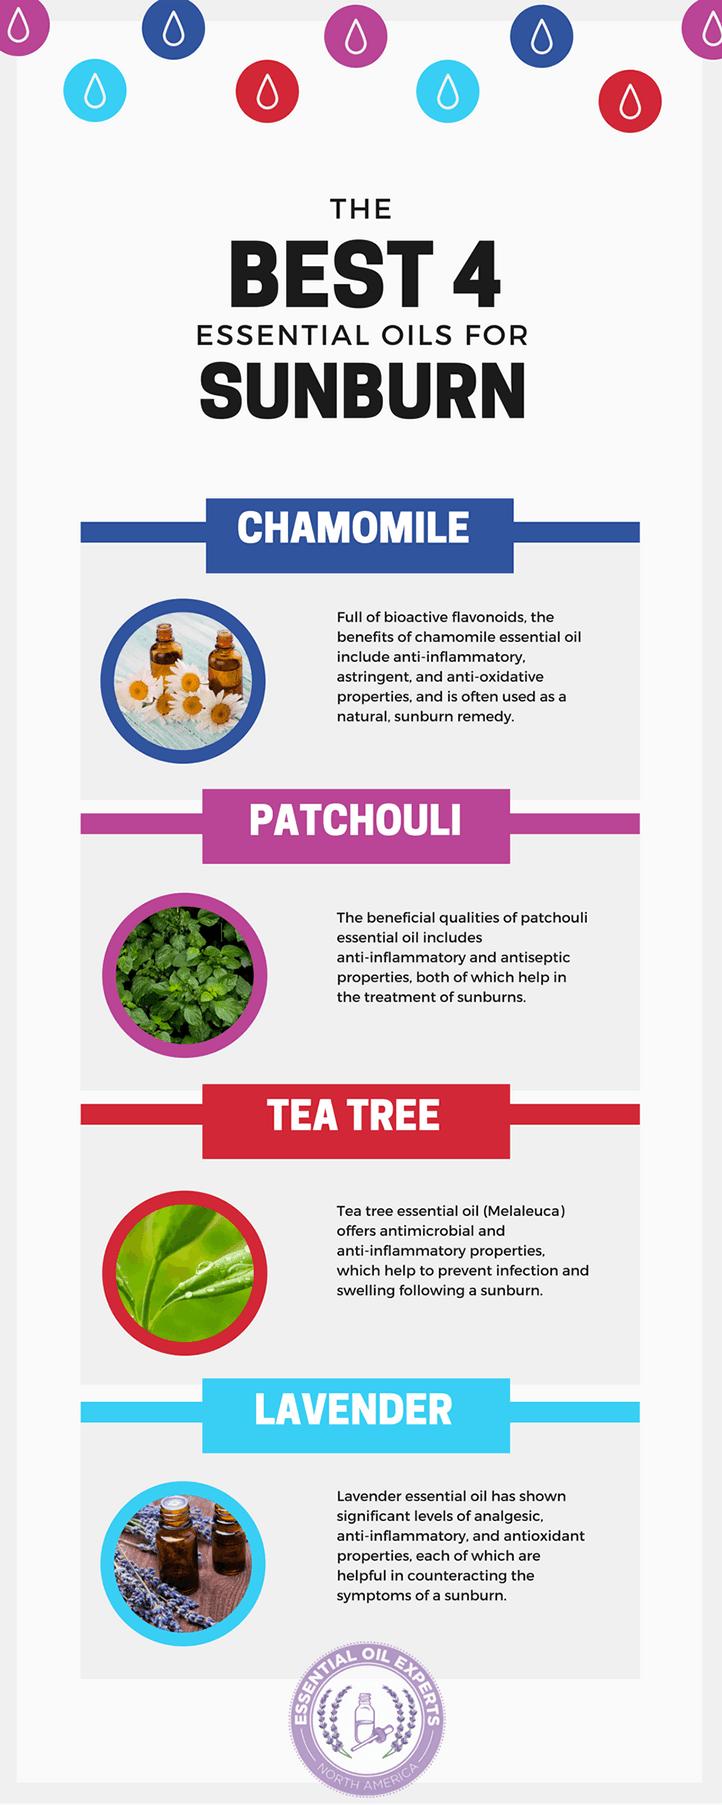 essential oils for sunburn, sunburn remedies